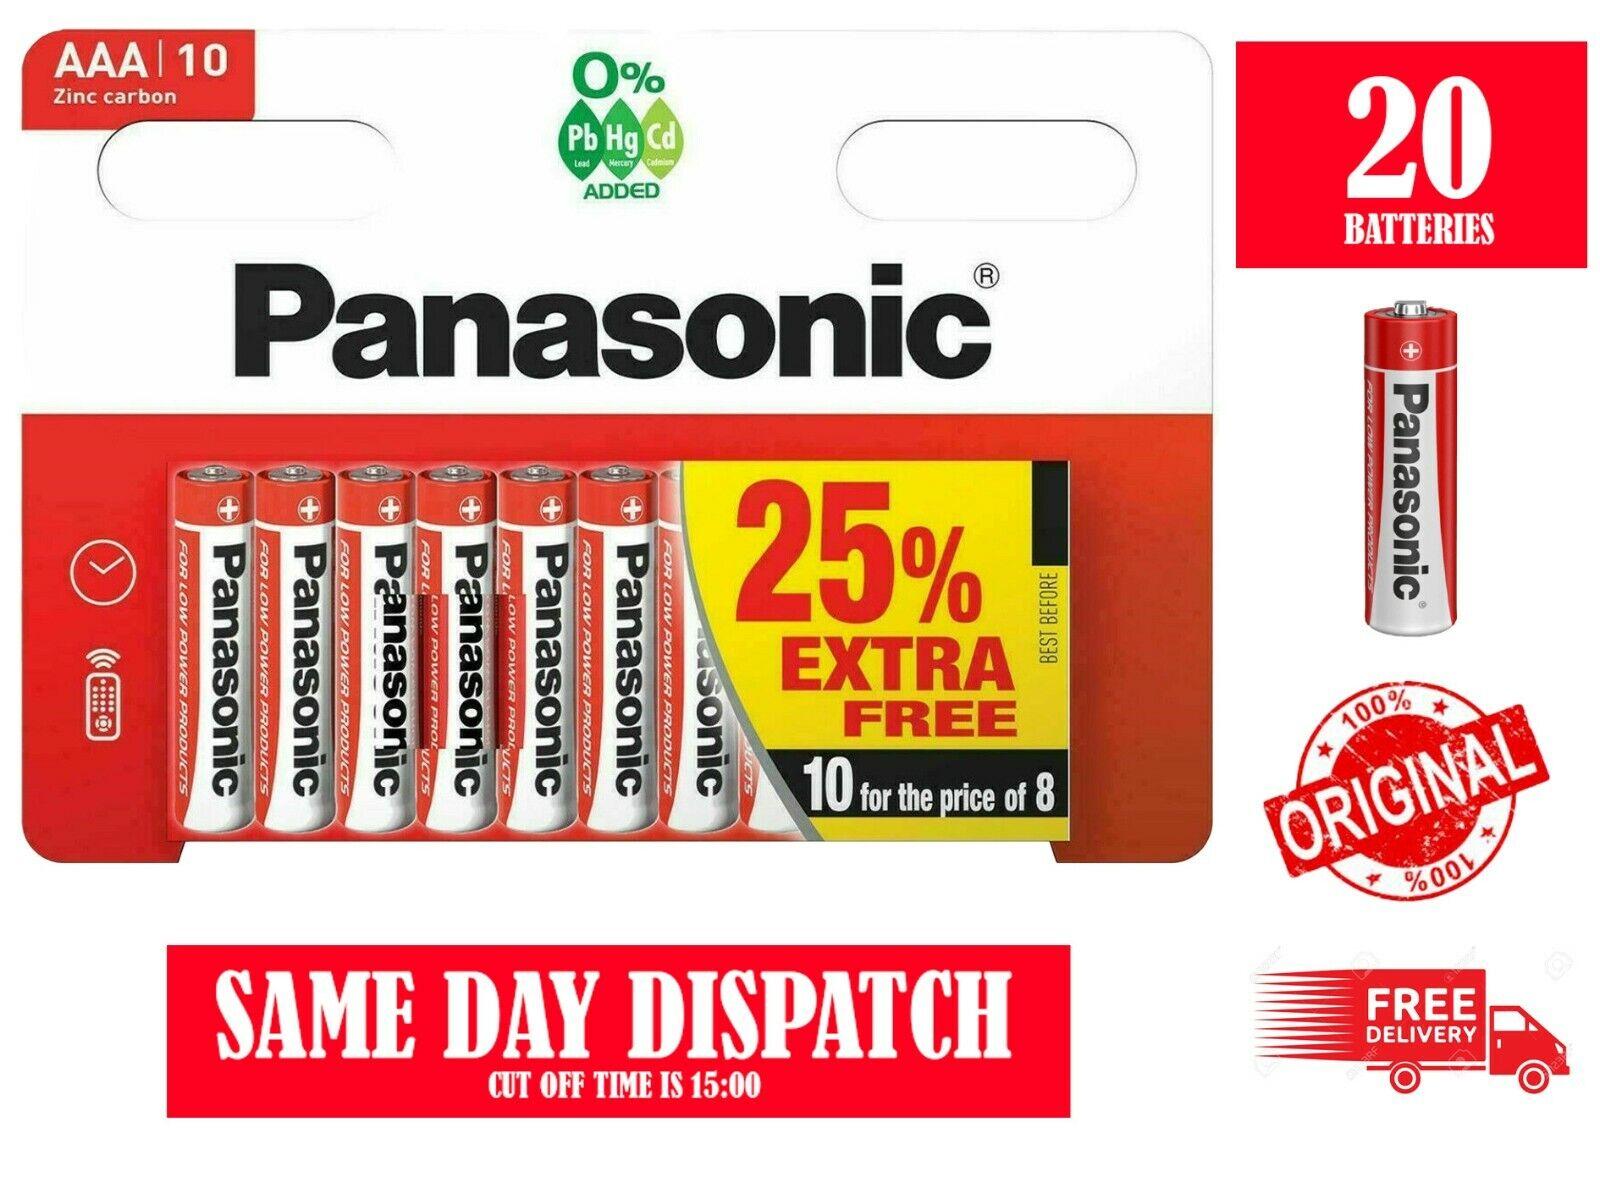 20 x AAA PANASONIC Zinc Carbon Batteries - New LR3 1.5V Expiry 2024